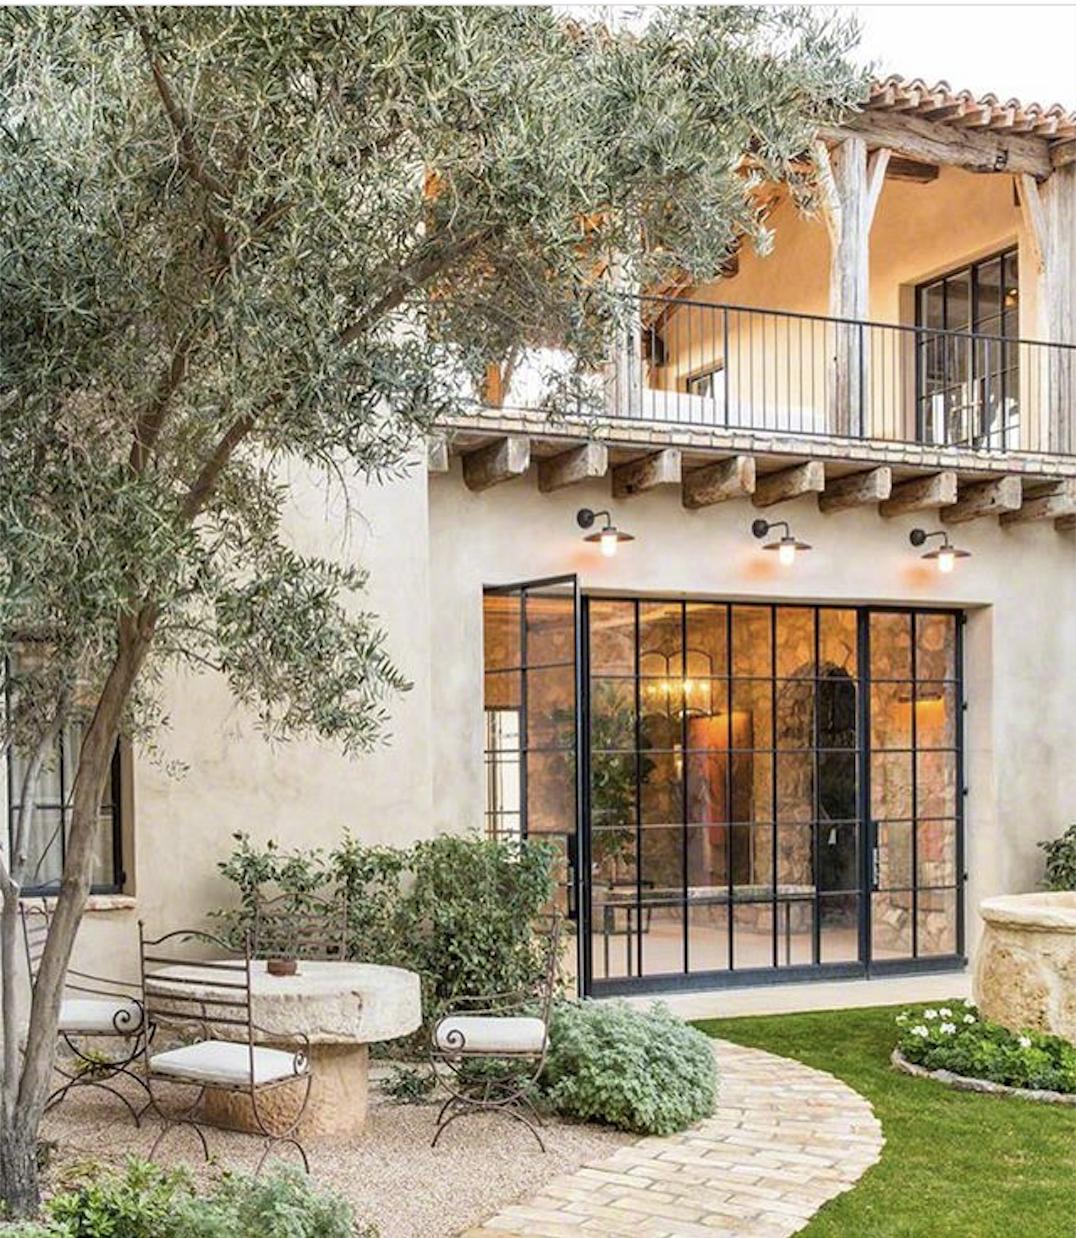 Vetrate nel 2019 case in stile spagnolo case for Vetrate case moderne